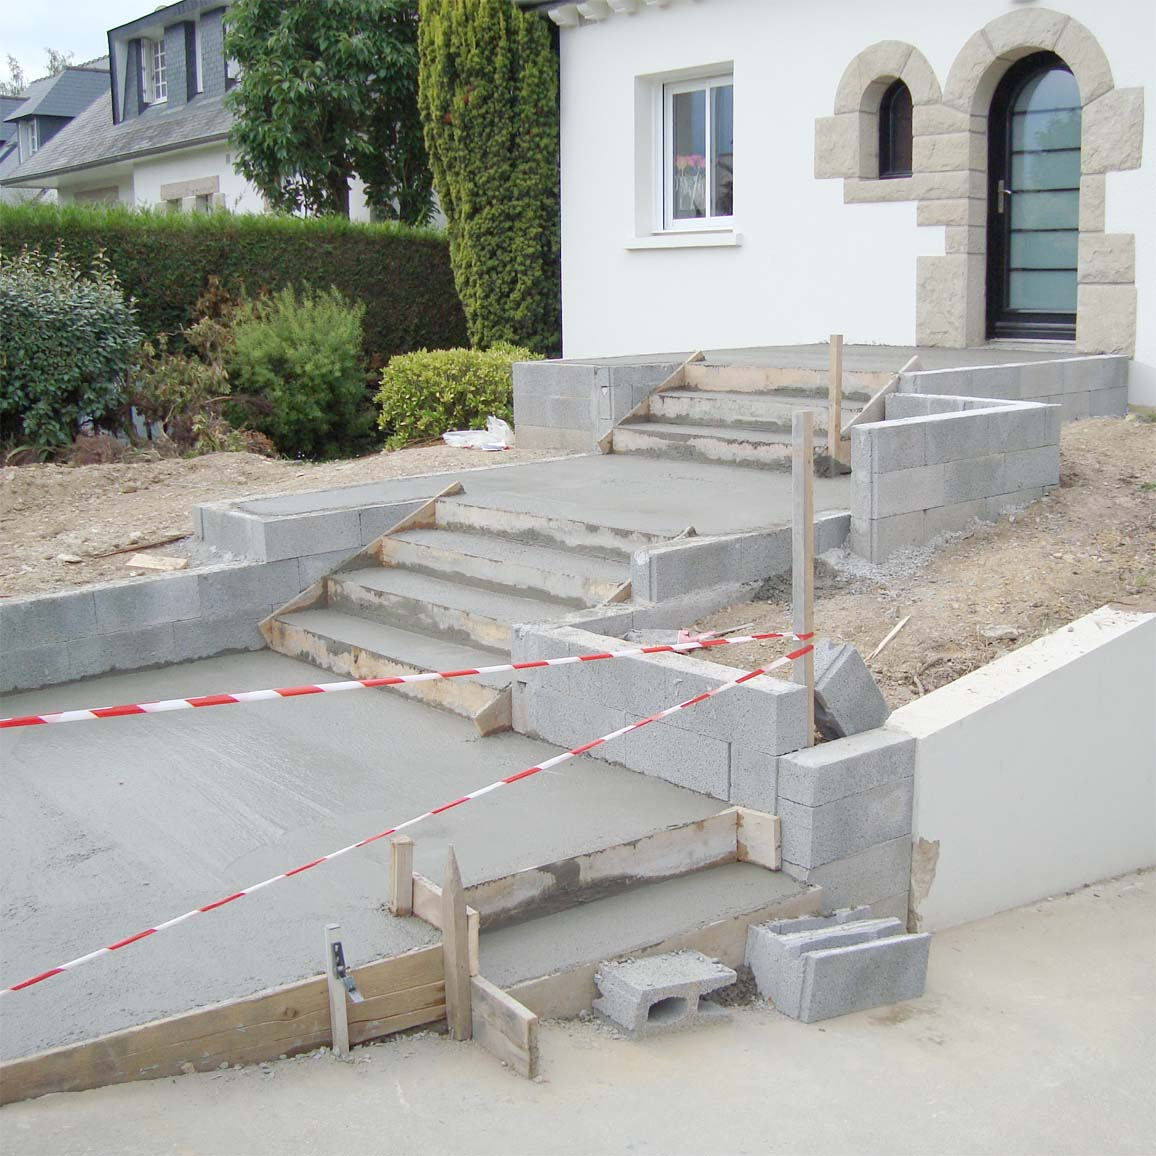 Vert l 39 ouest paysagiste coach jardin formation for Carreler une terrasse en beton